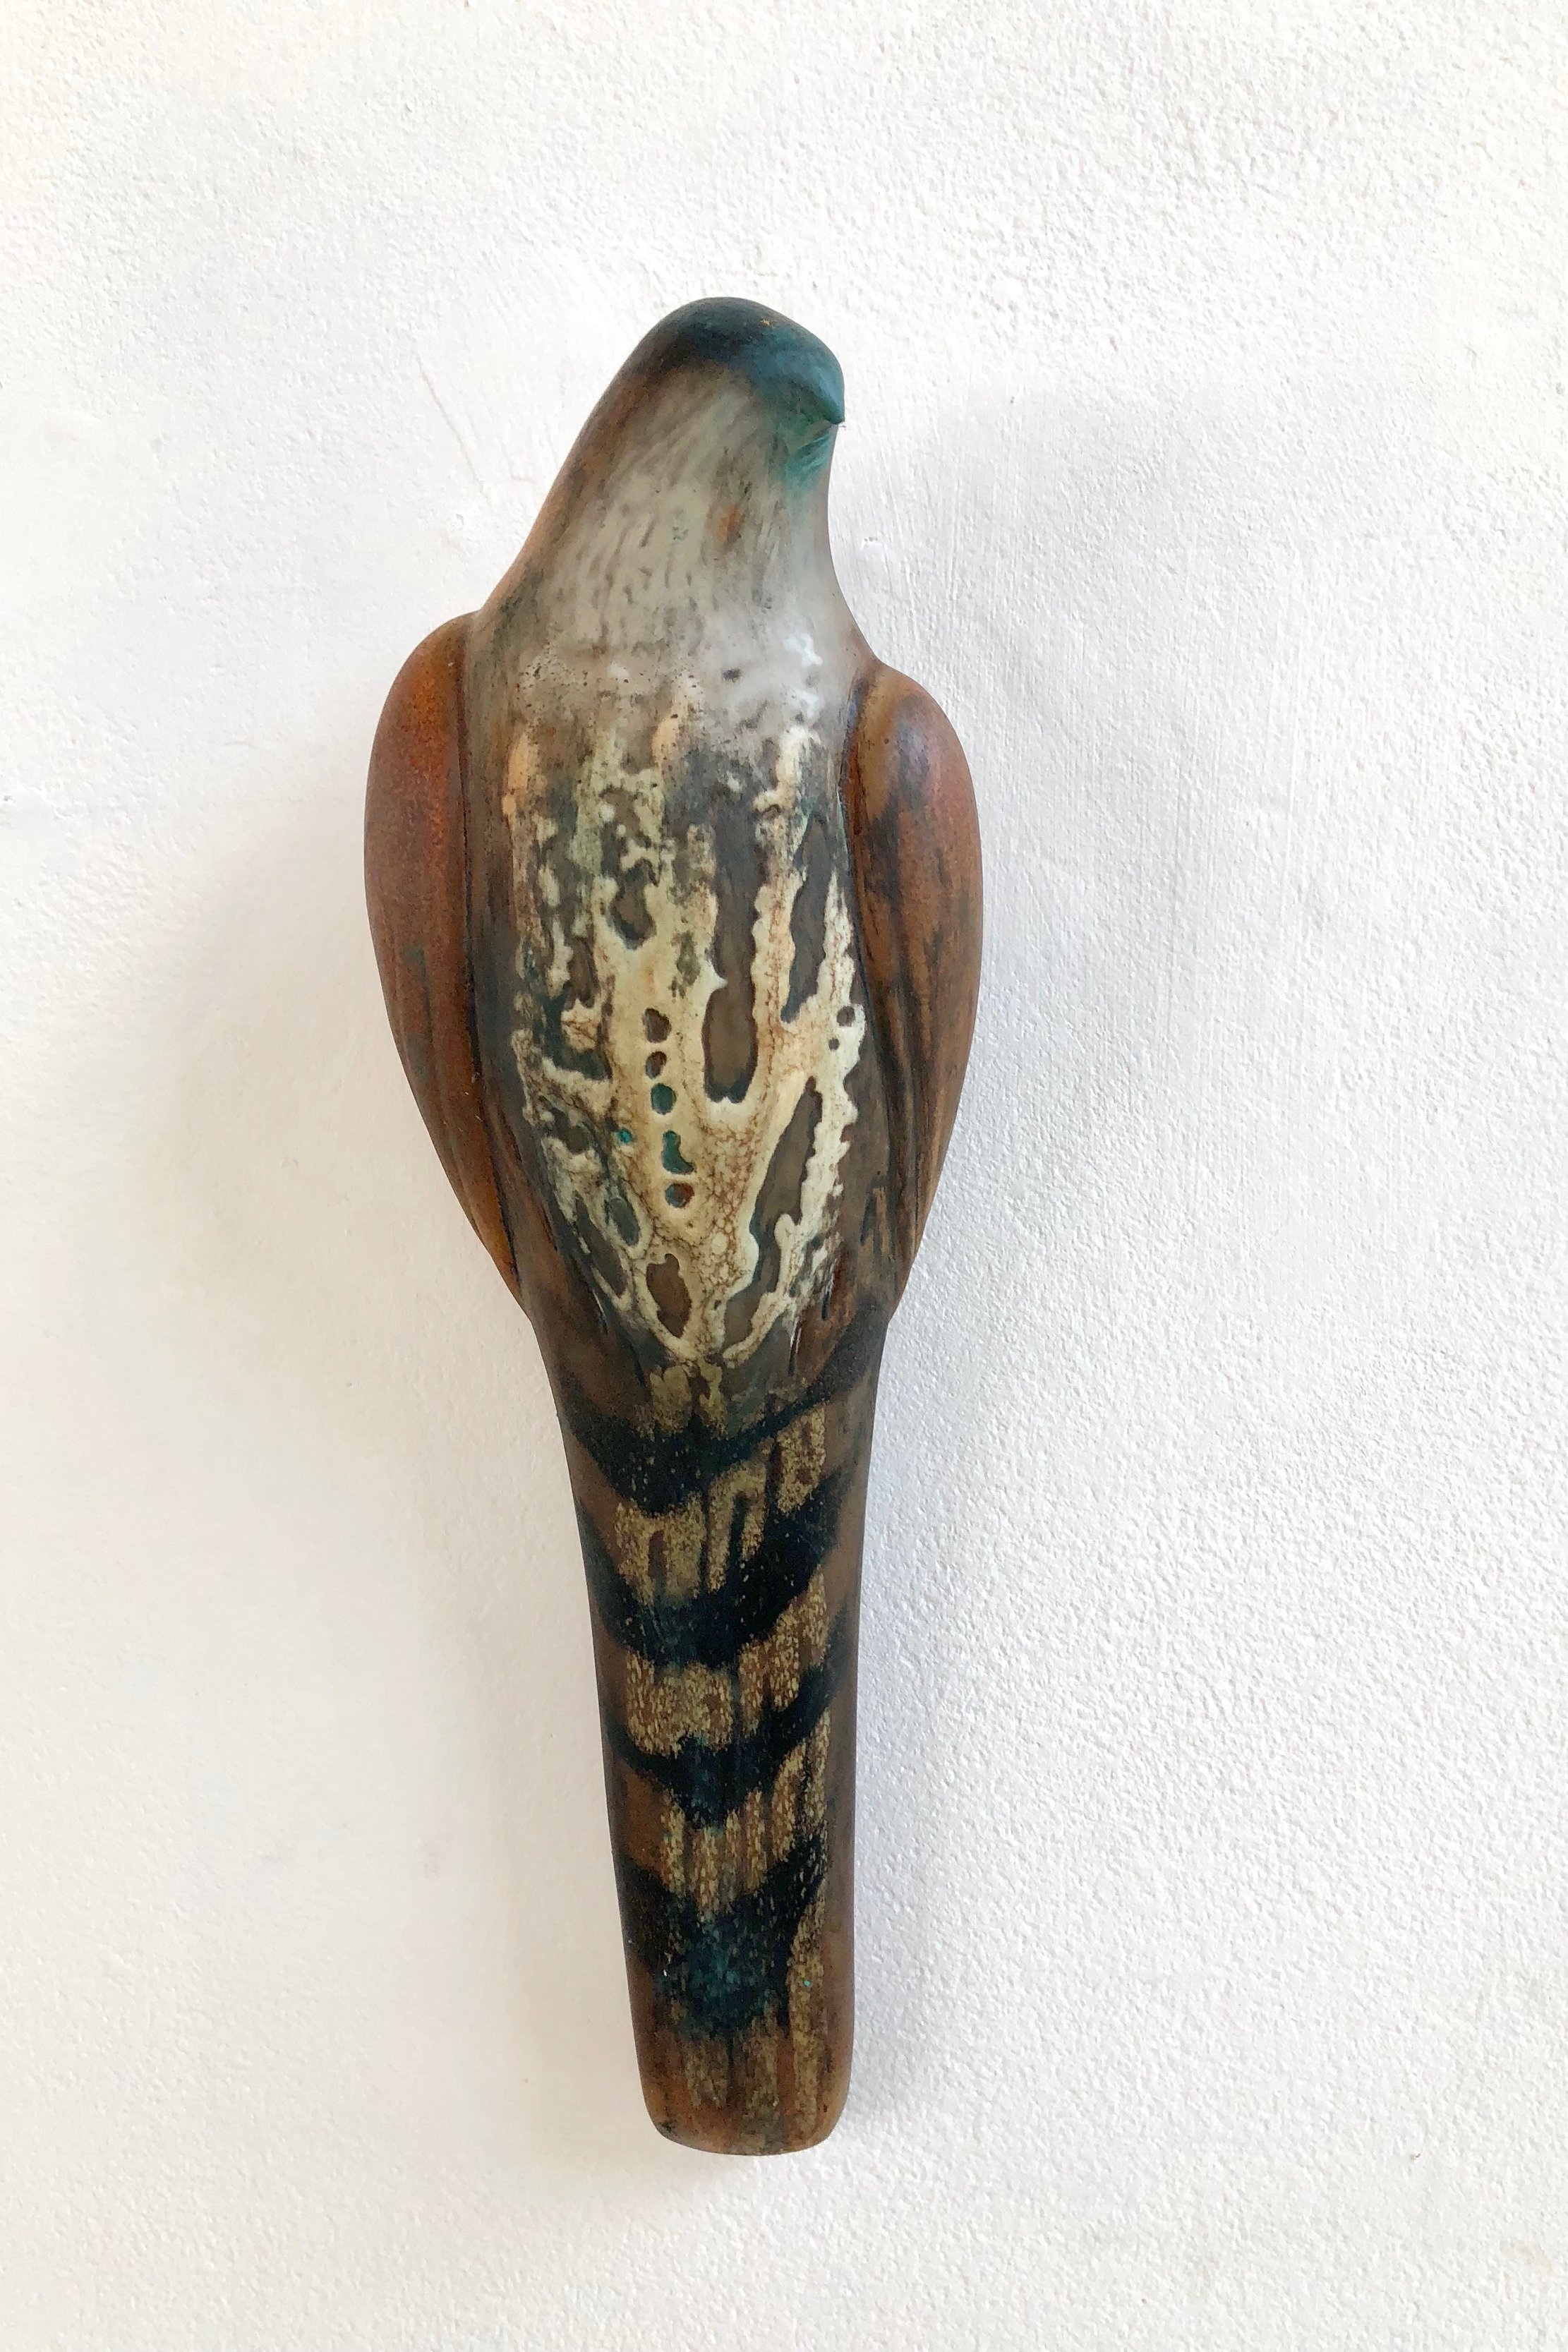 """Sienna Lace Chest Bird,"" 2019  Handblown pigmented glass 16 x 3 x 5 inches"